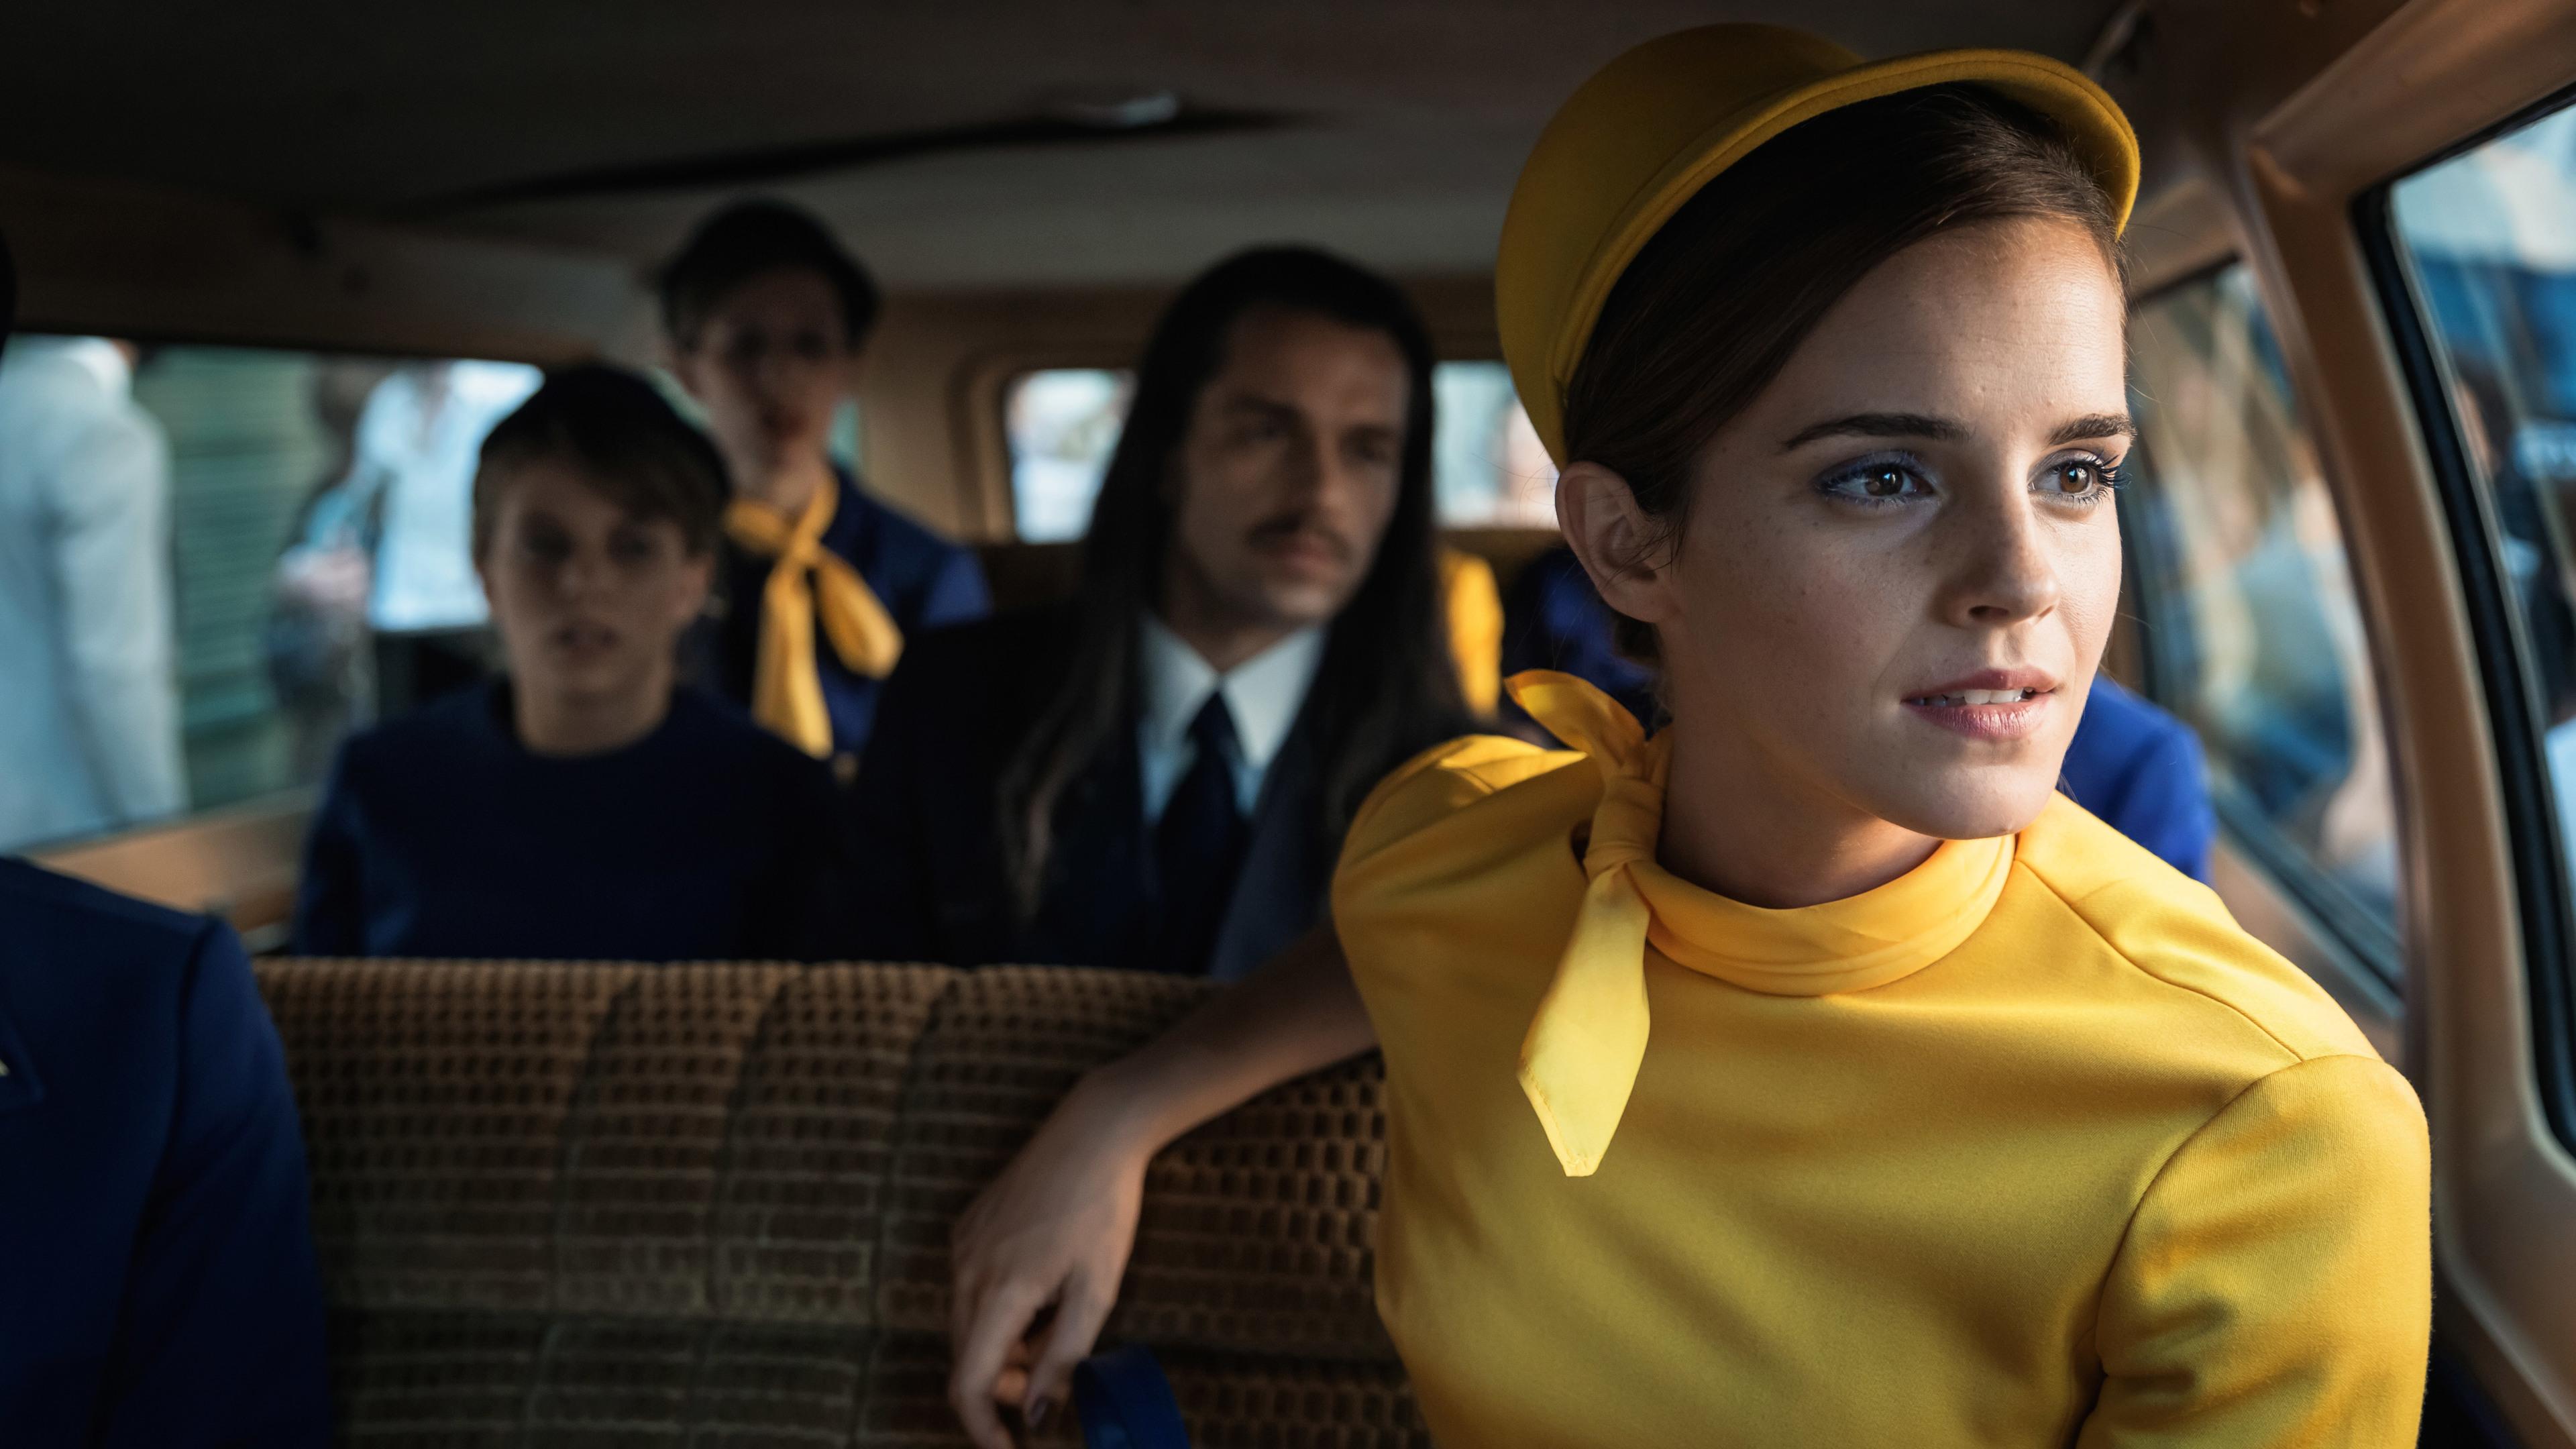 emma watson in colonia 1536858971 - Emma Watson In Colonia - hd-wallpapers, girls wallpapers, emma watson wallpapers, colonia wallpapers, celebrities wallpapers, 4k-wallpapers